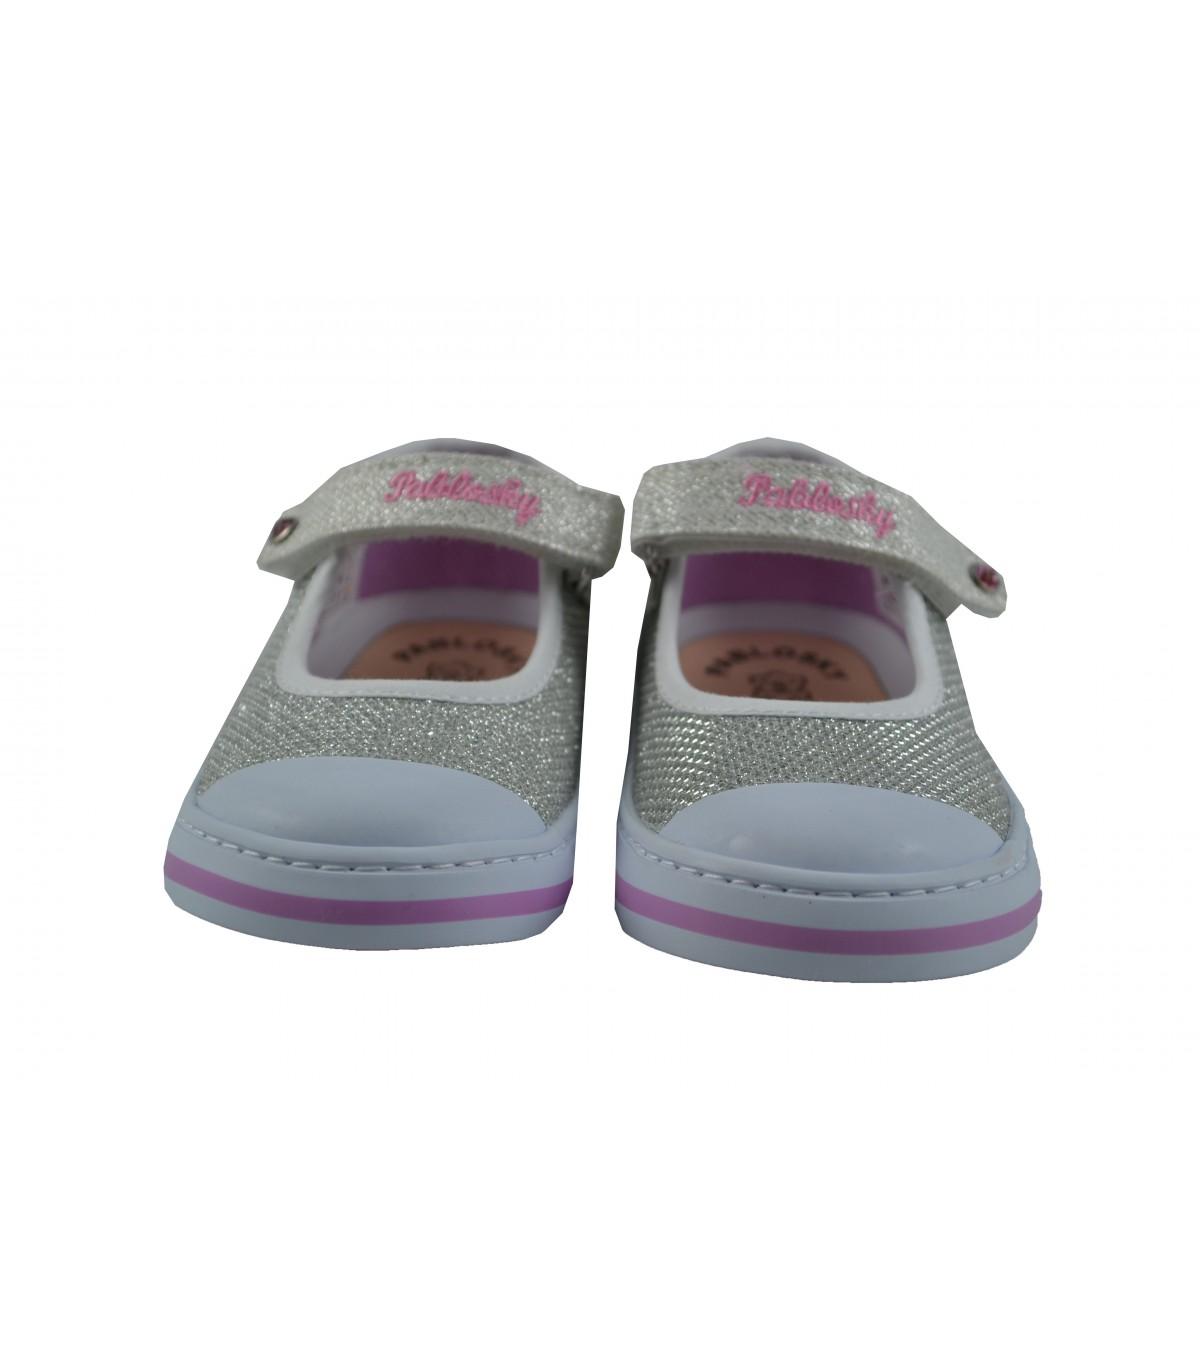 8b32ecb08d0 Merceditas PABLOSKY lona glitter | Zapatos Online | Calzado Niña